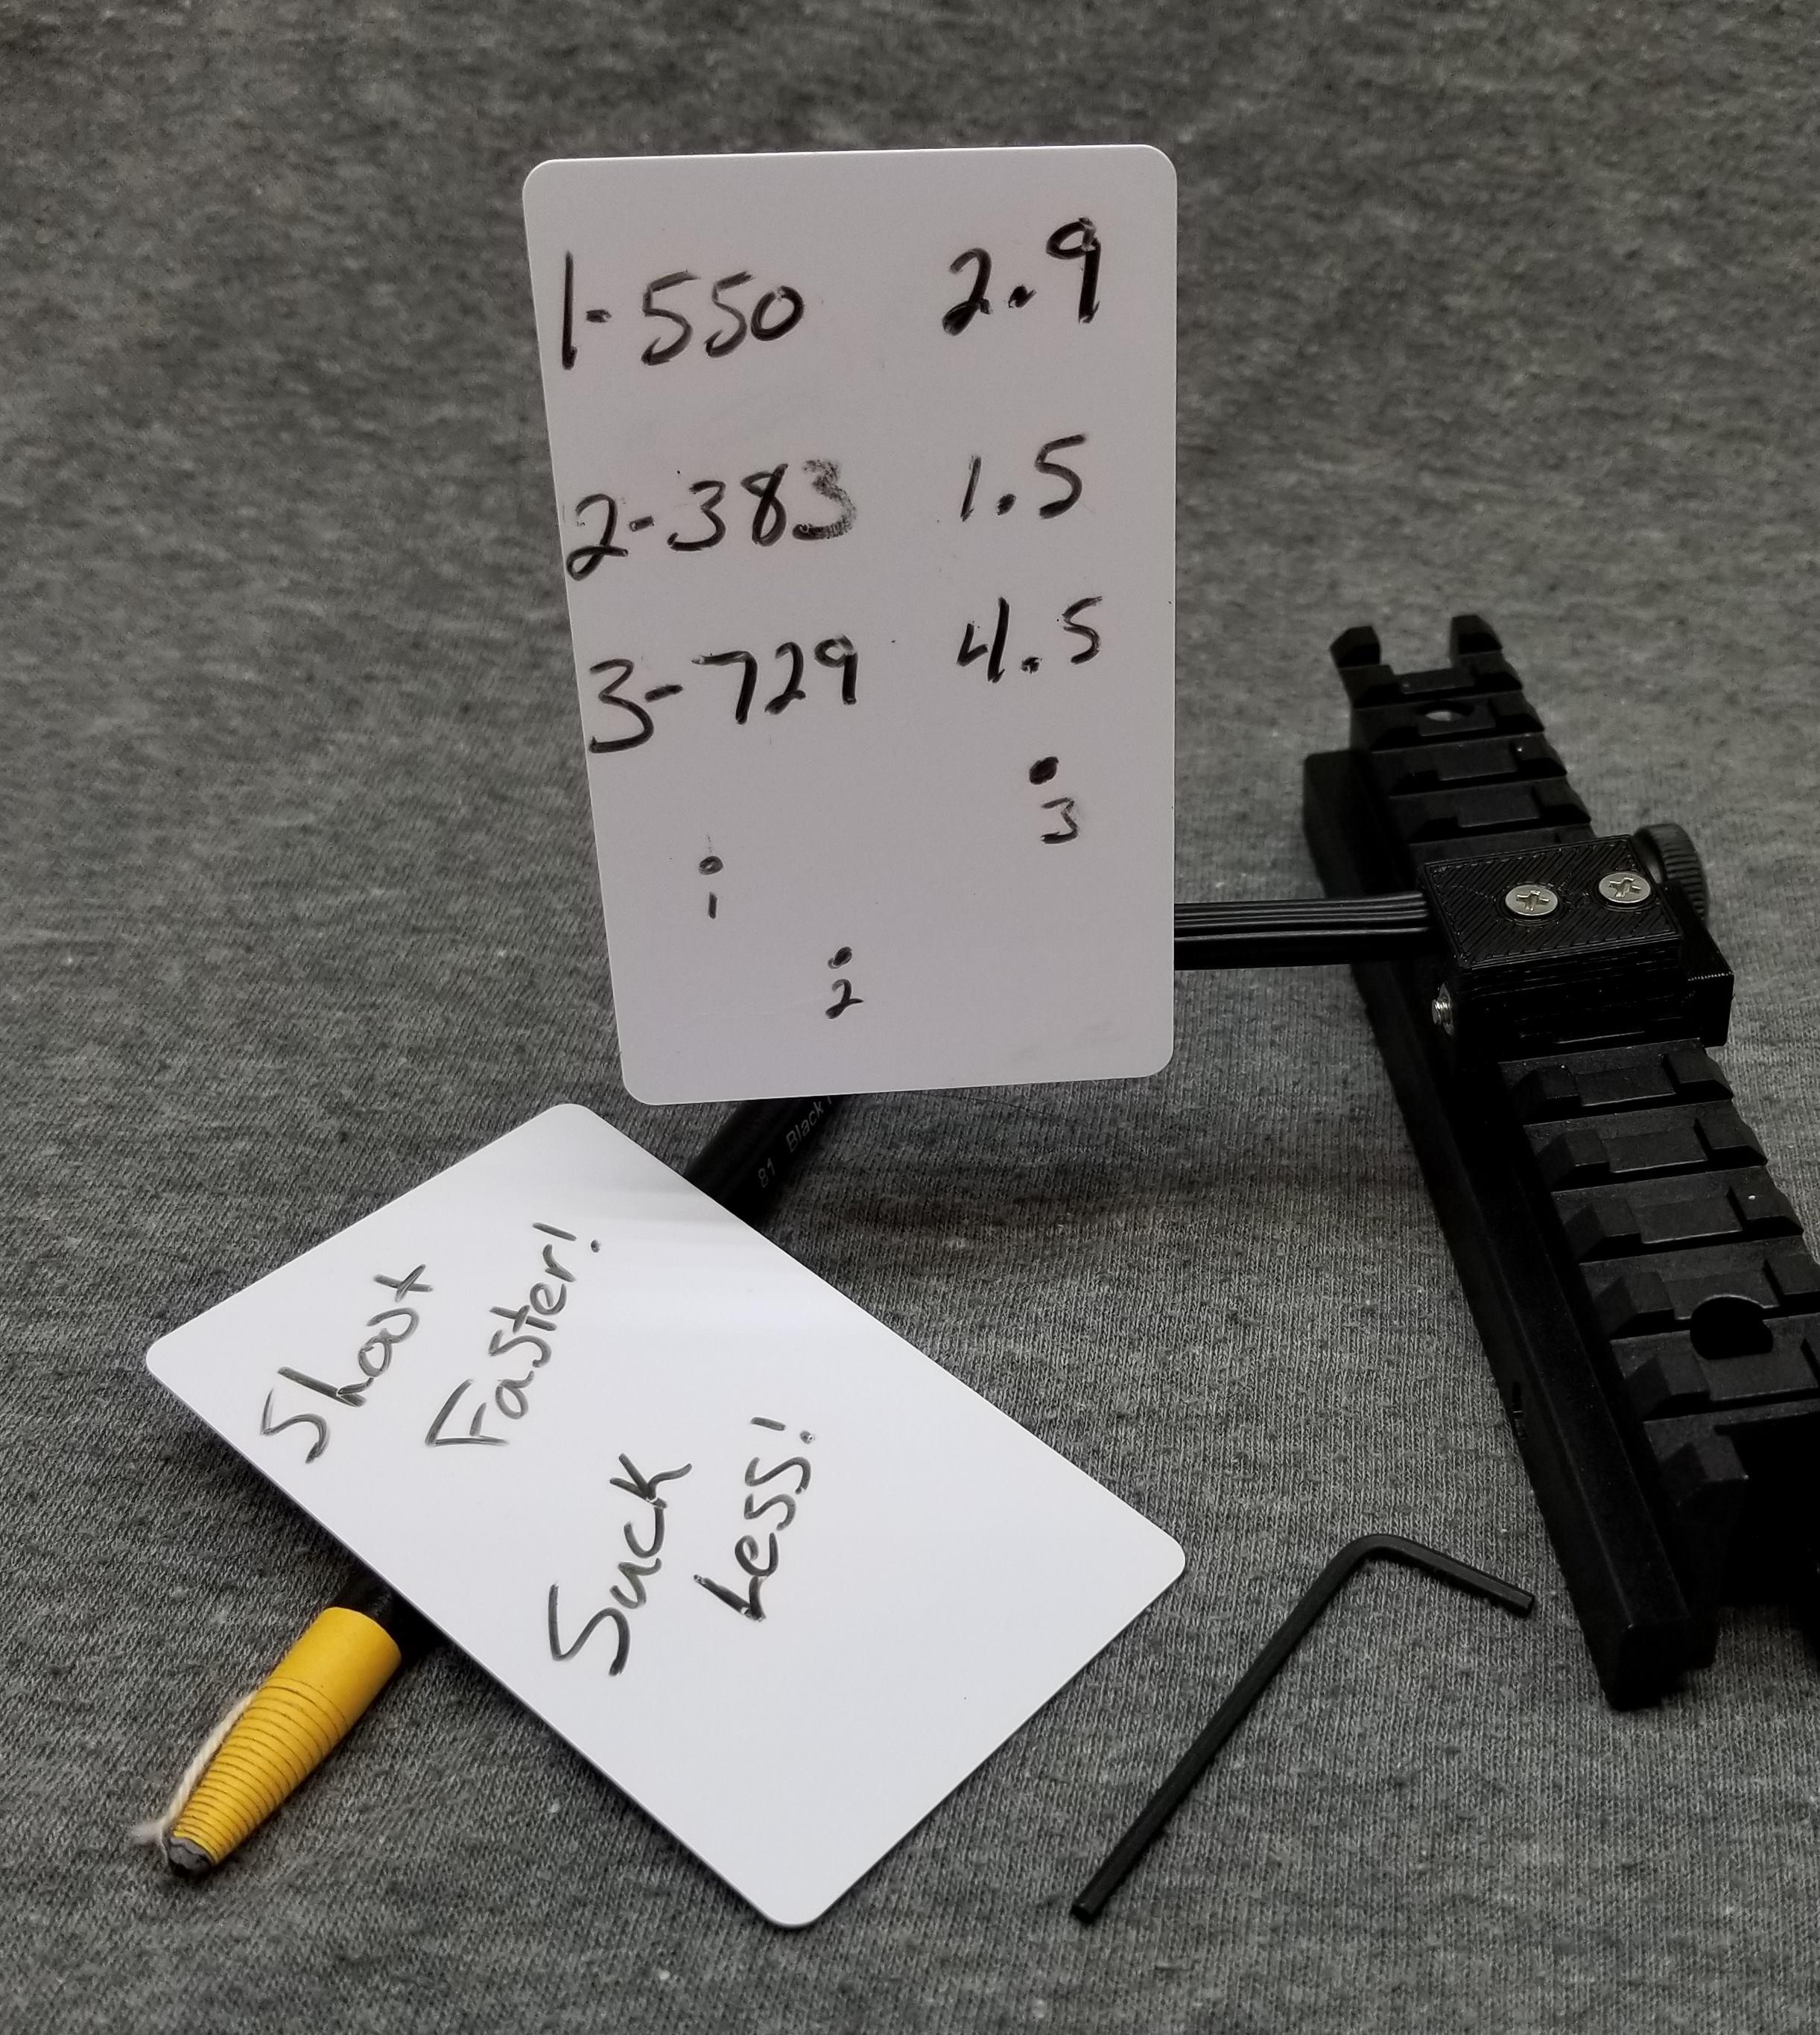 BLAMM Datacard Systems